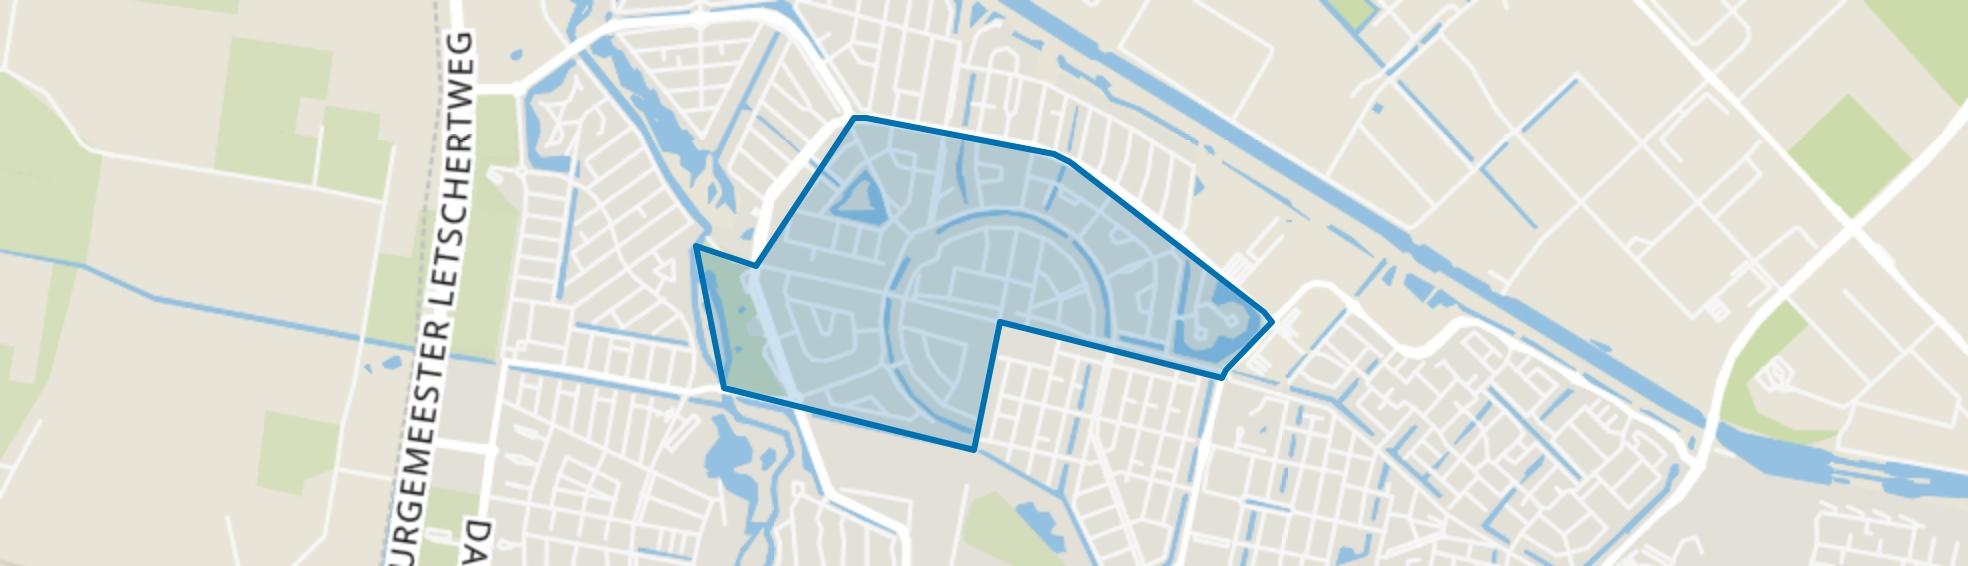 Tuindorp De Kievit, Tilburg map